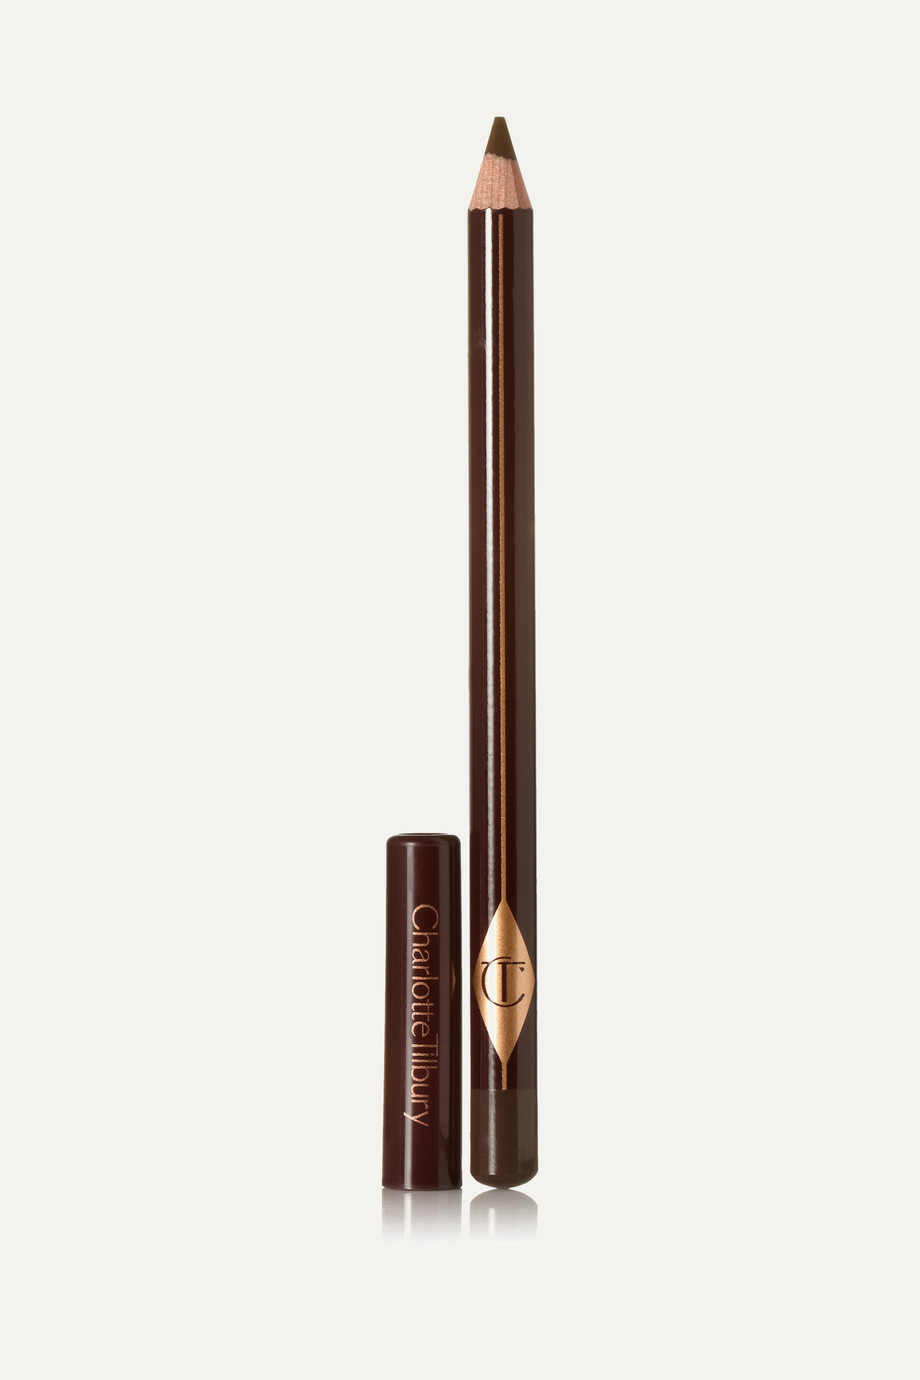 Charlotte Tilbury The Classic Eye Powder Pencil - Shimmering Brown